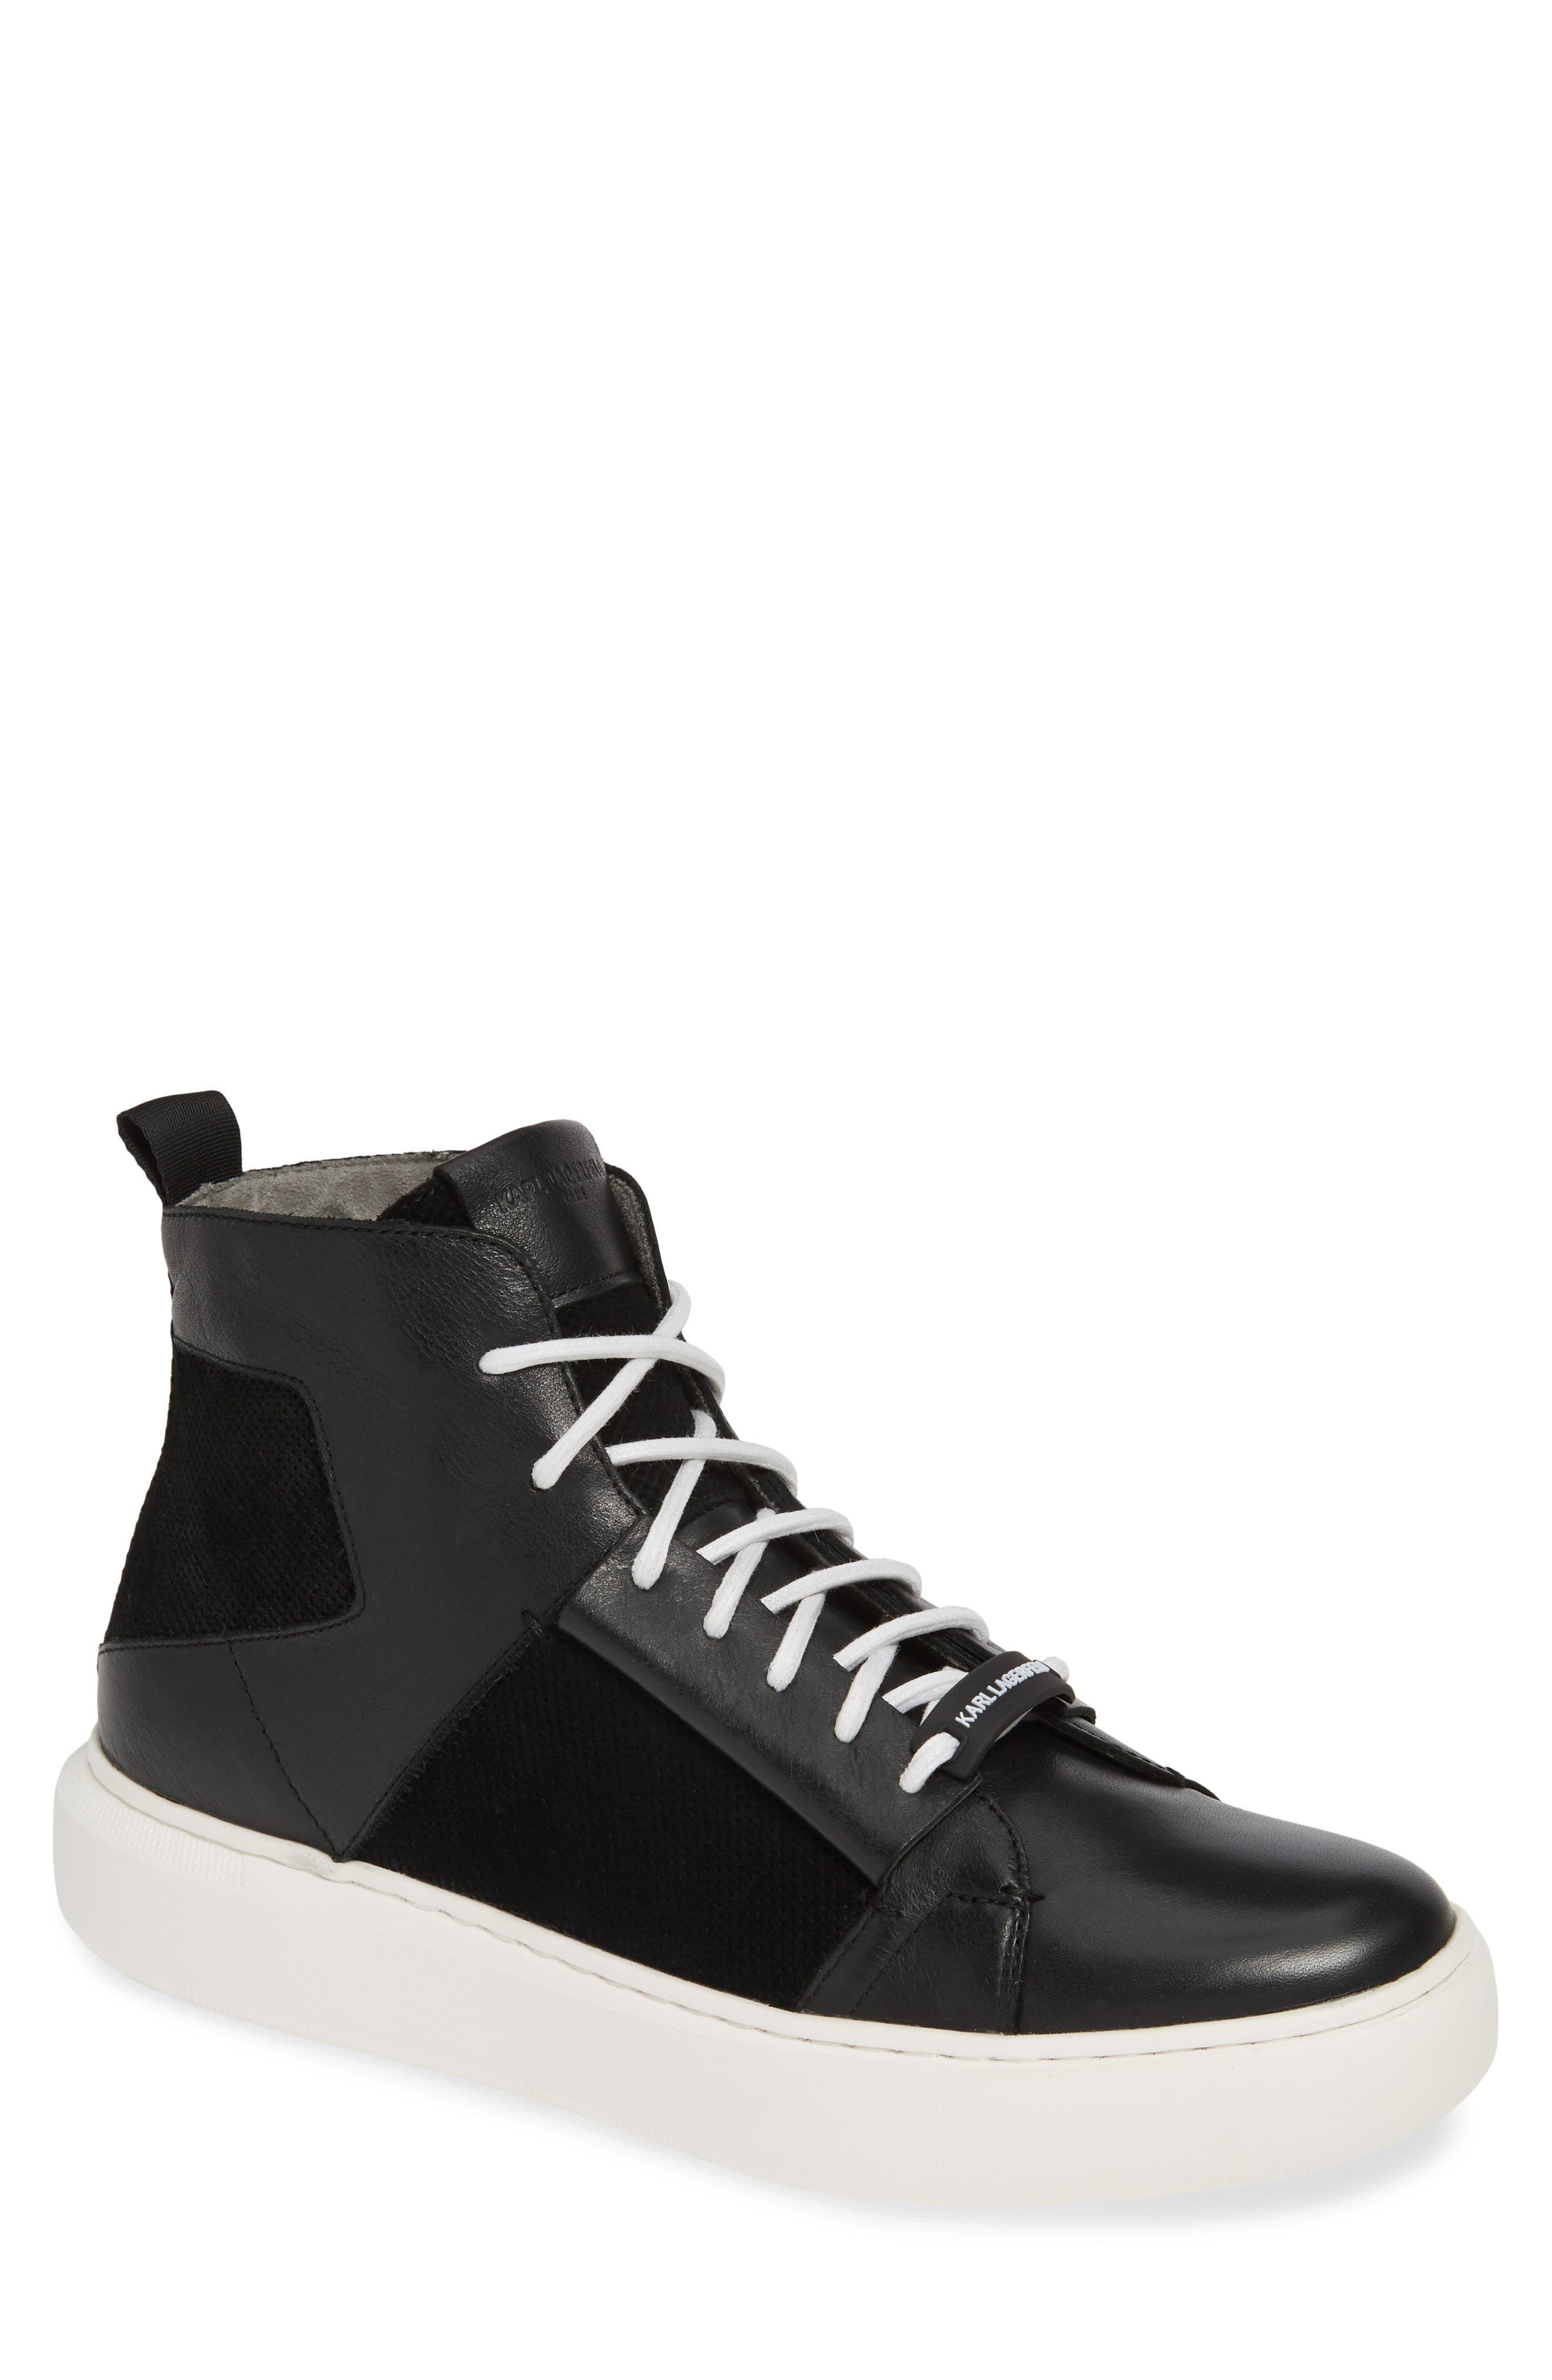 KARL LAGERFELD PARIS, High Top Sneaker, Main thumbnail 1, color, BLACK LEATHER